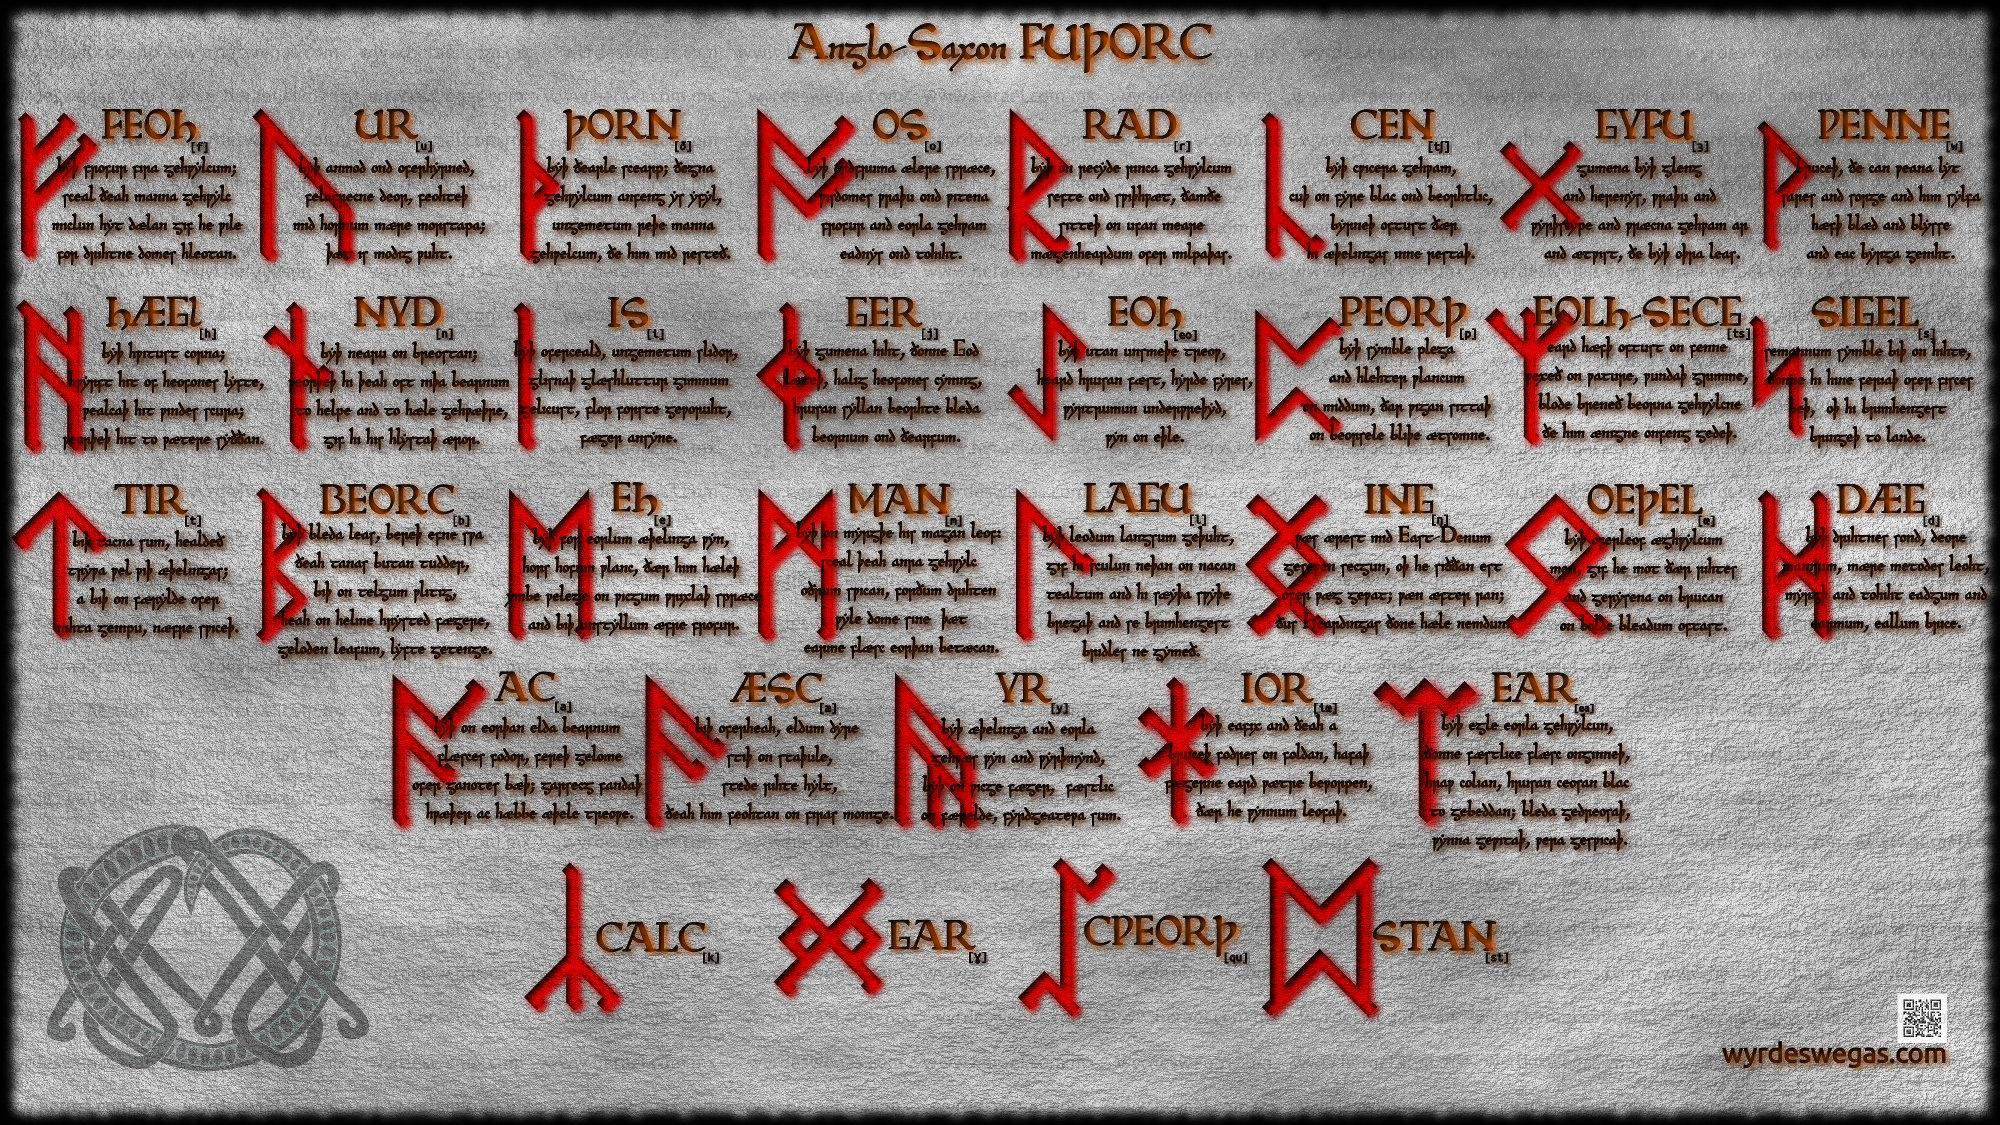 Fuþorc Anglosajon futhorc anglo-saxon runes